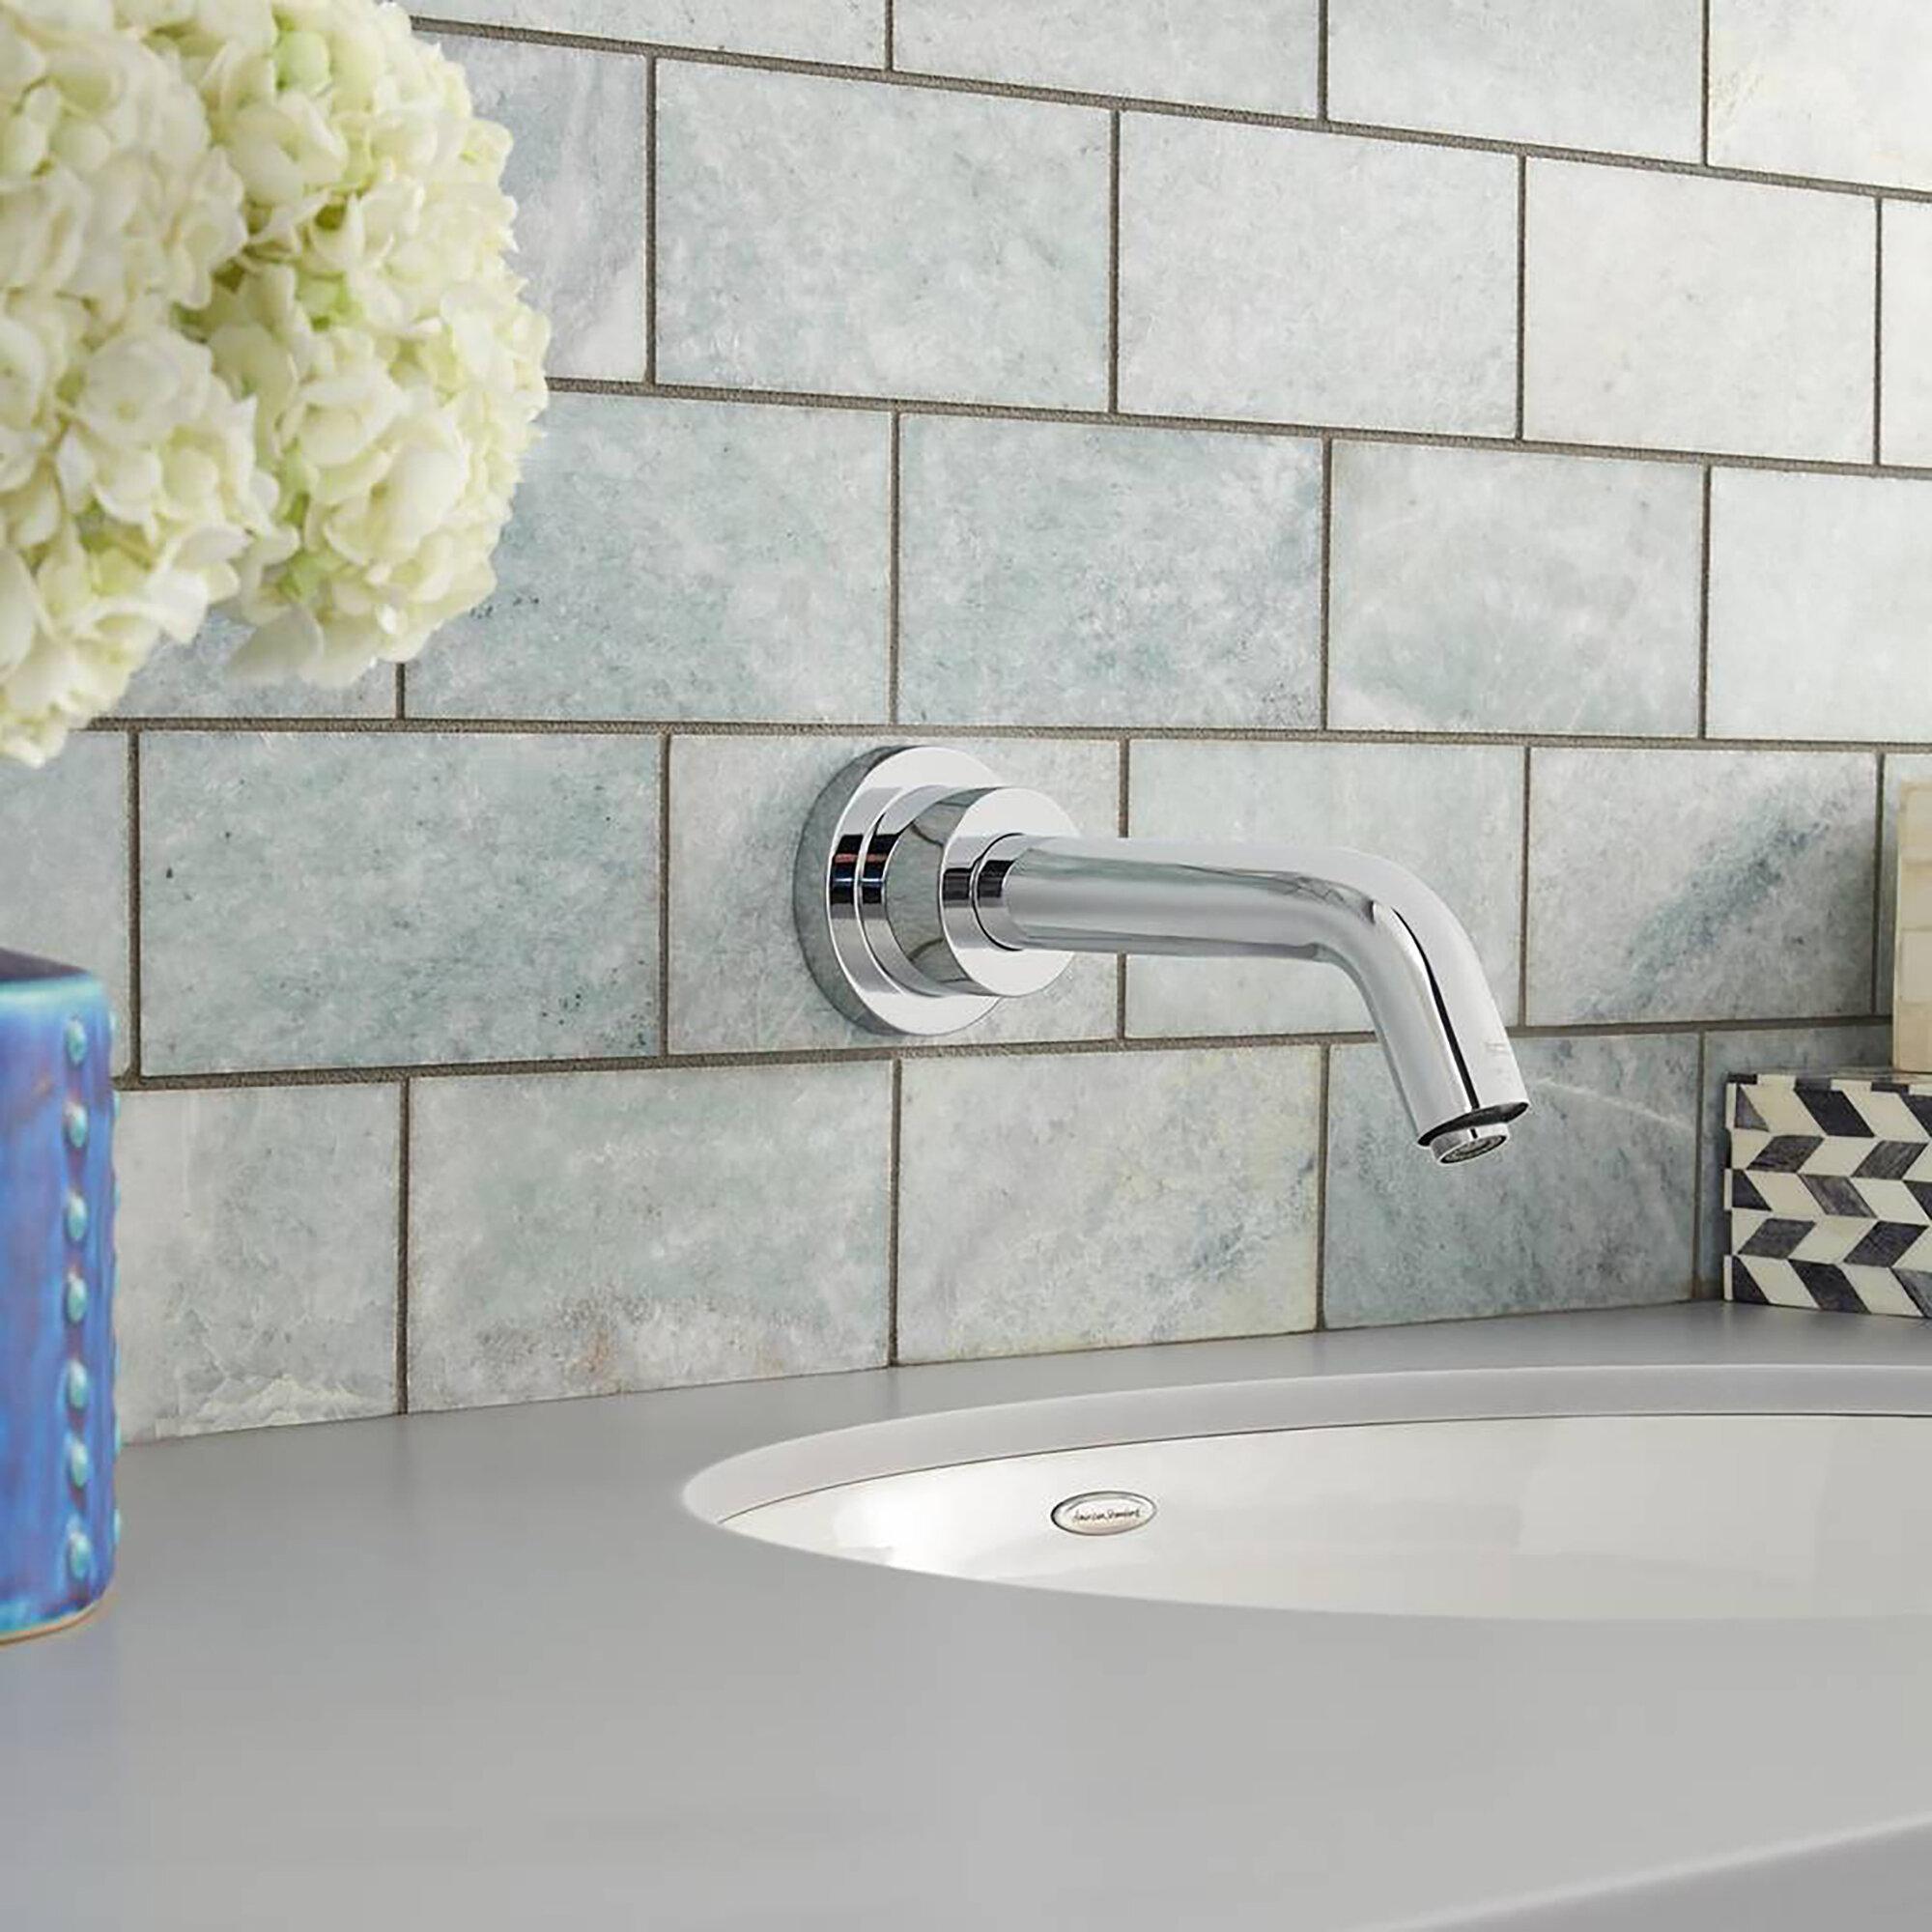 American Standard Serin Wall Mounted Bathroom Faucet Less Handles Wayfair